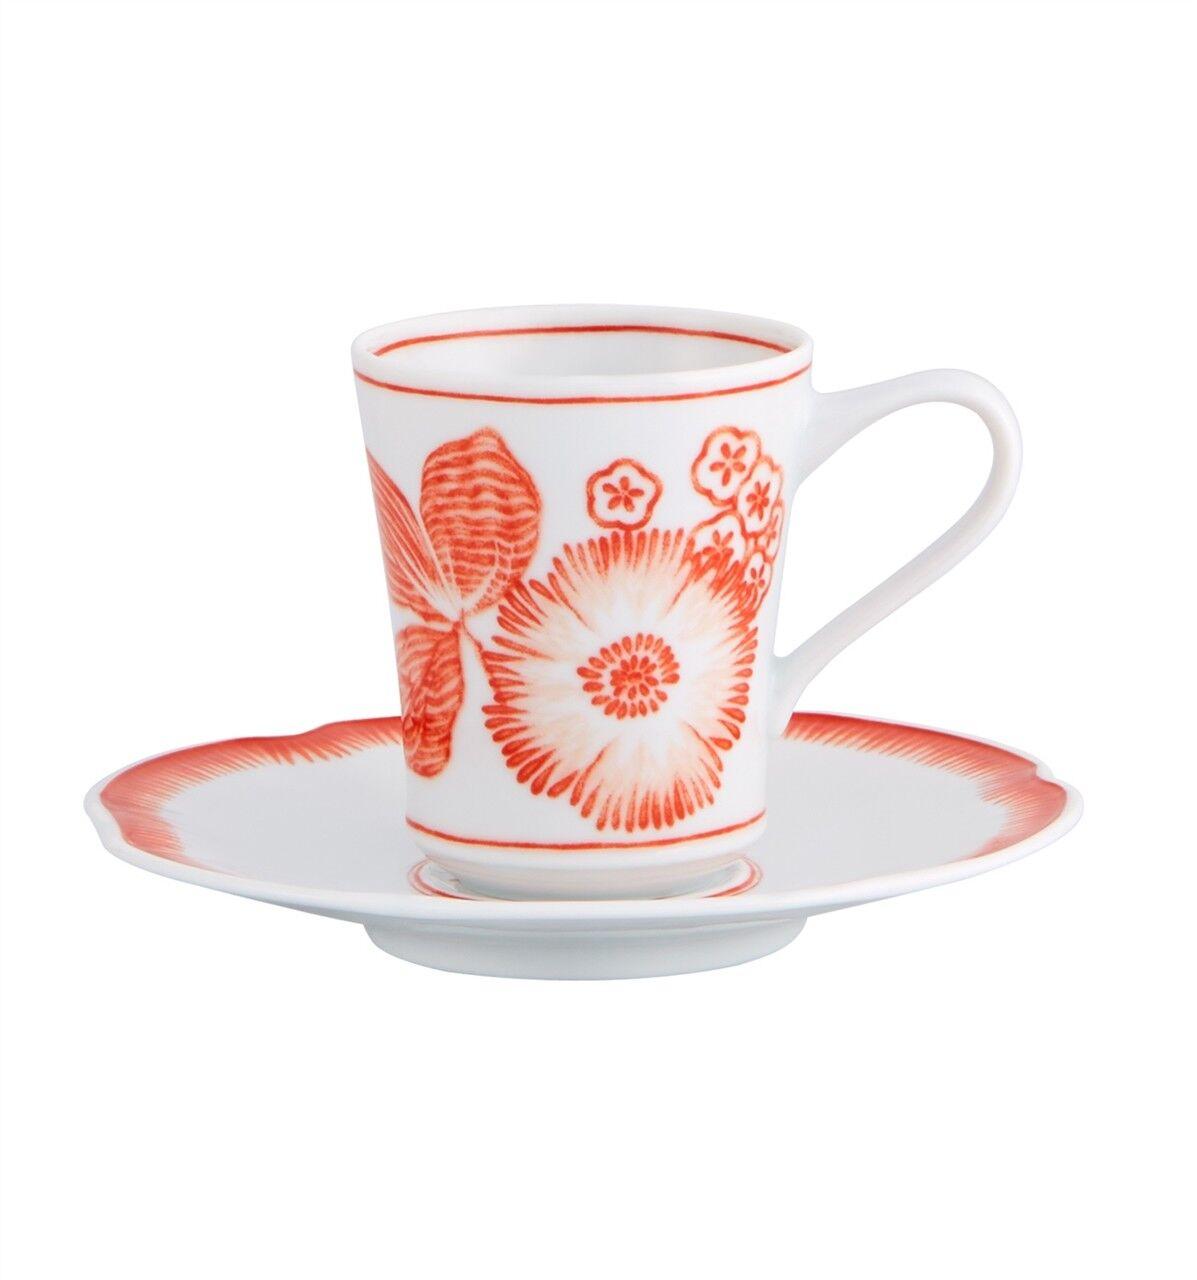 Vista Alegre Coralina Coffee Cup and Saucer - Set of 8